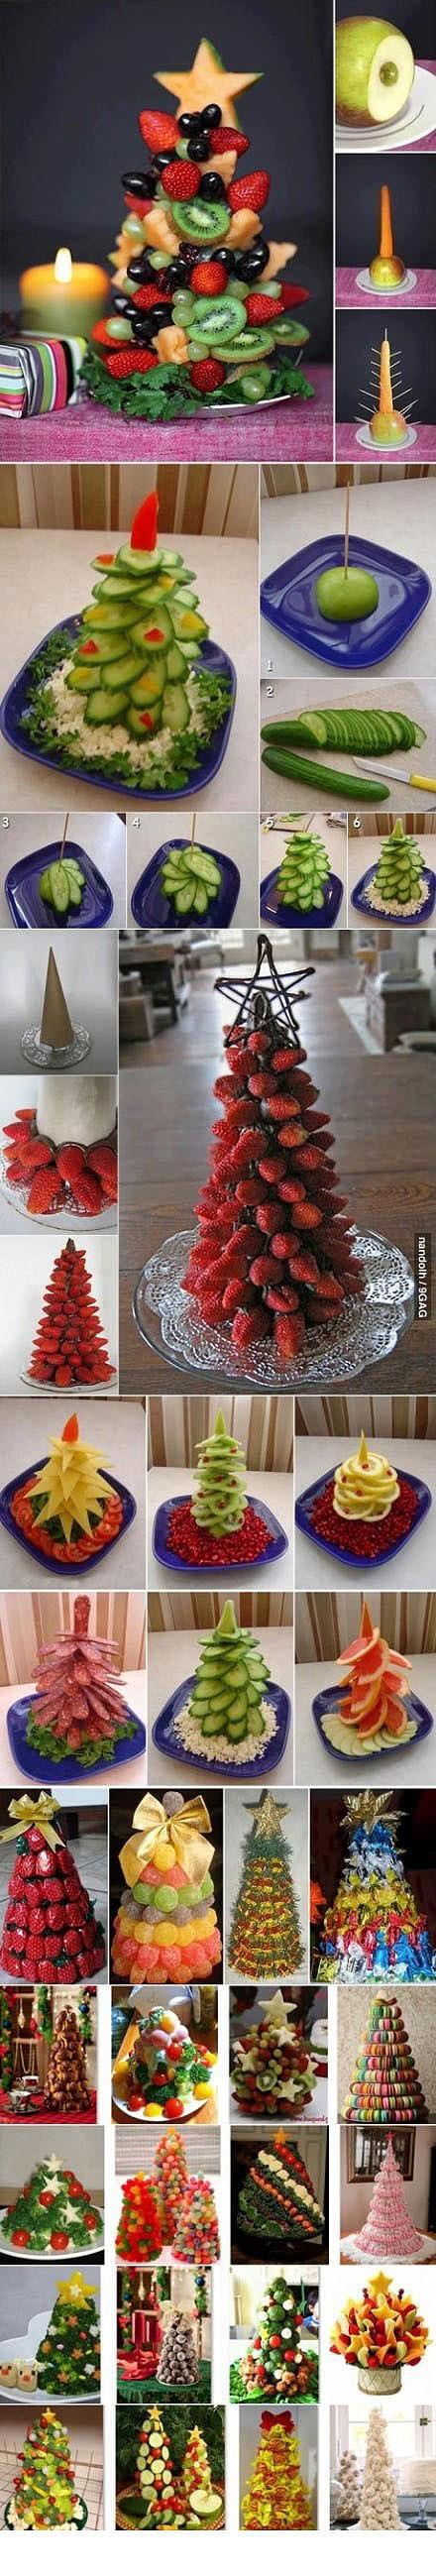 30 ways to make fruit Christmas trees